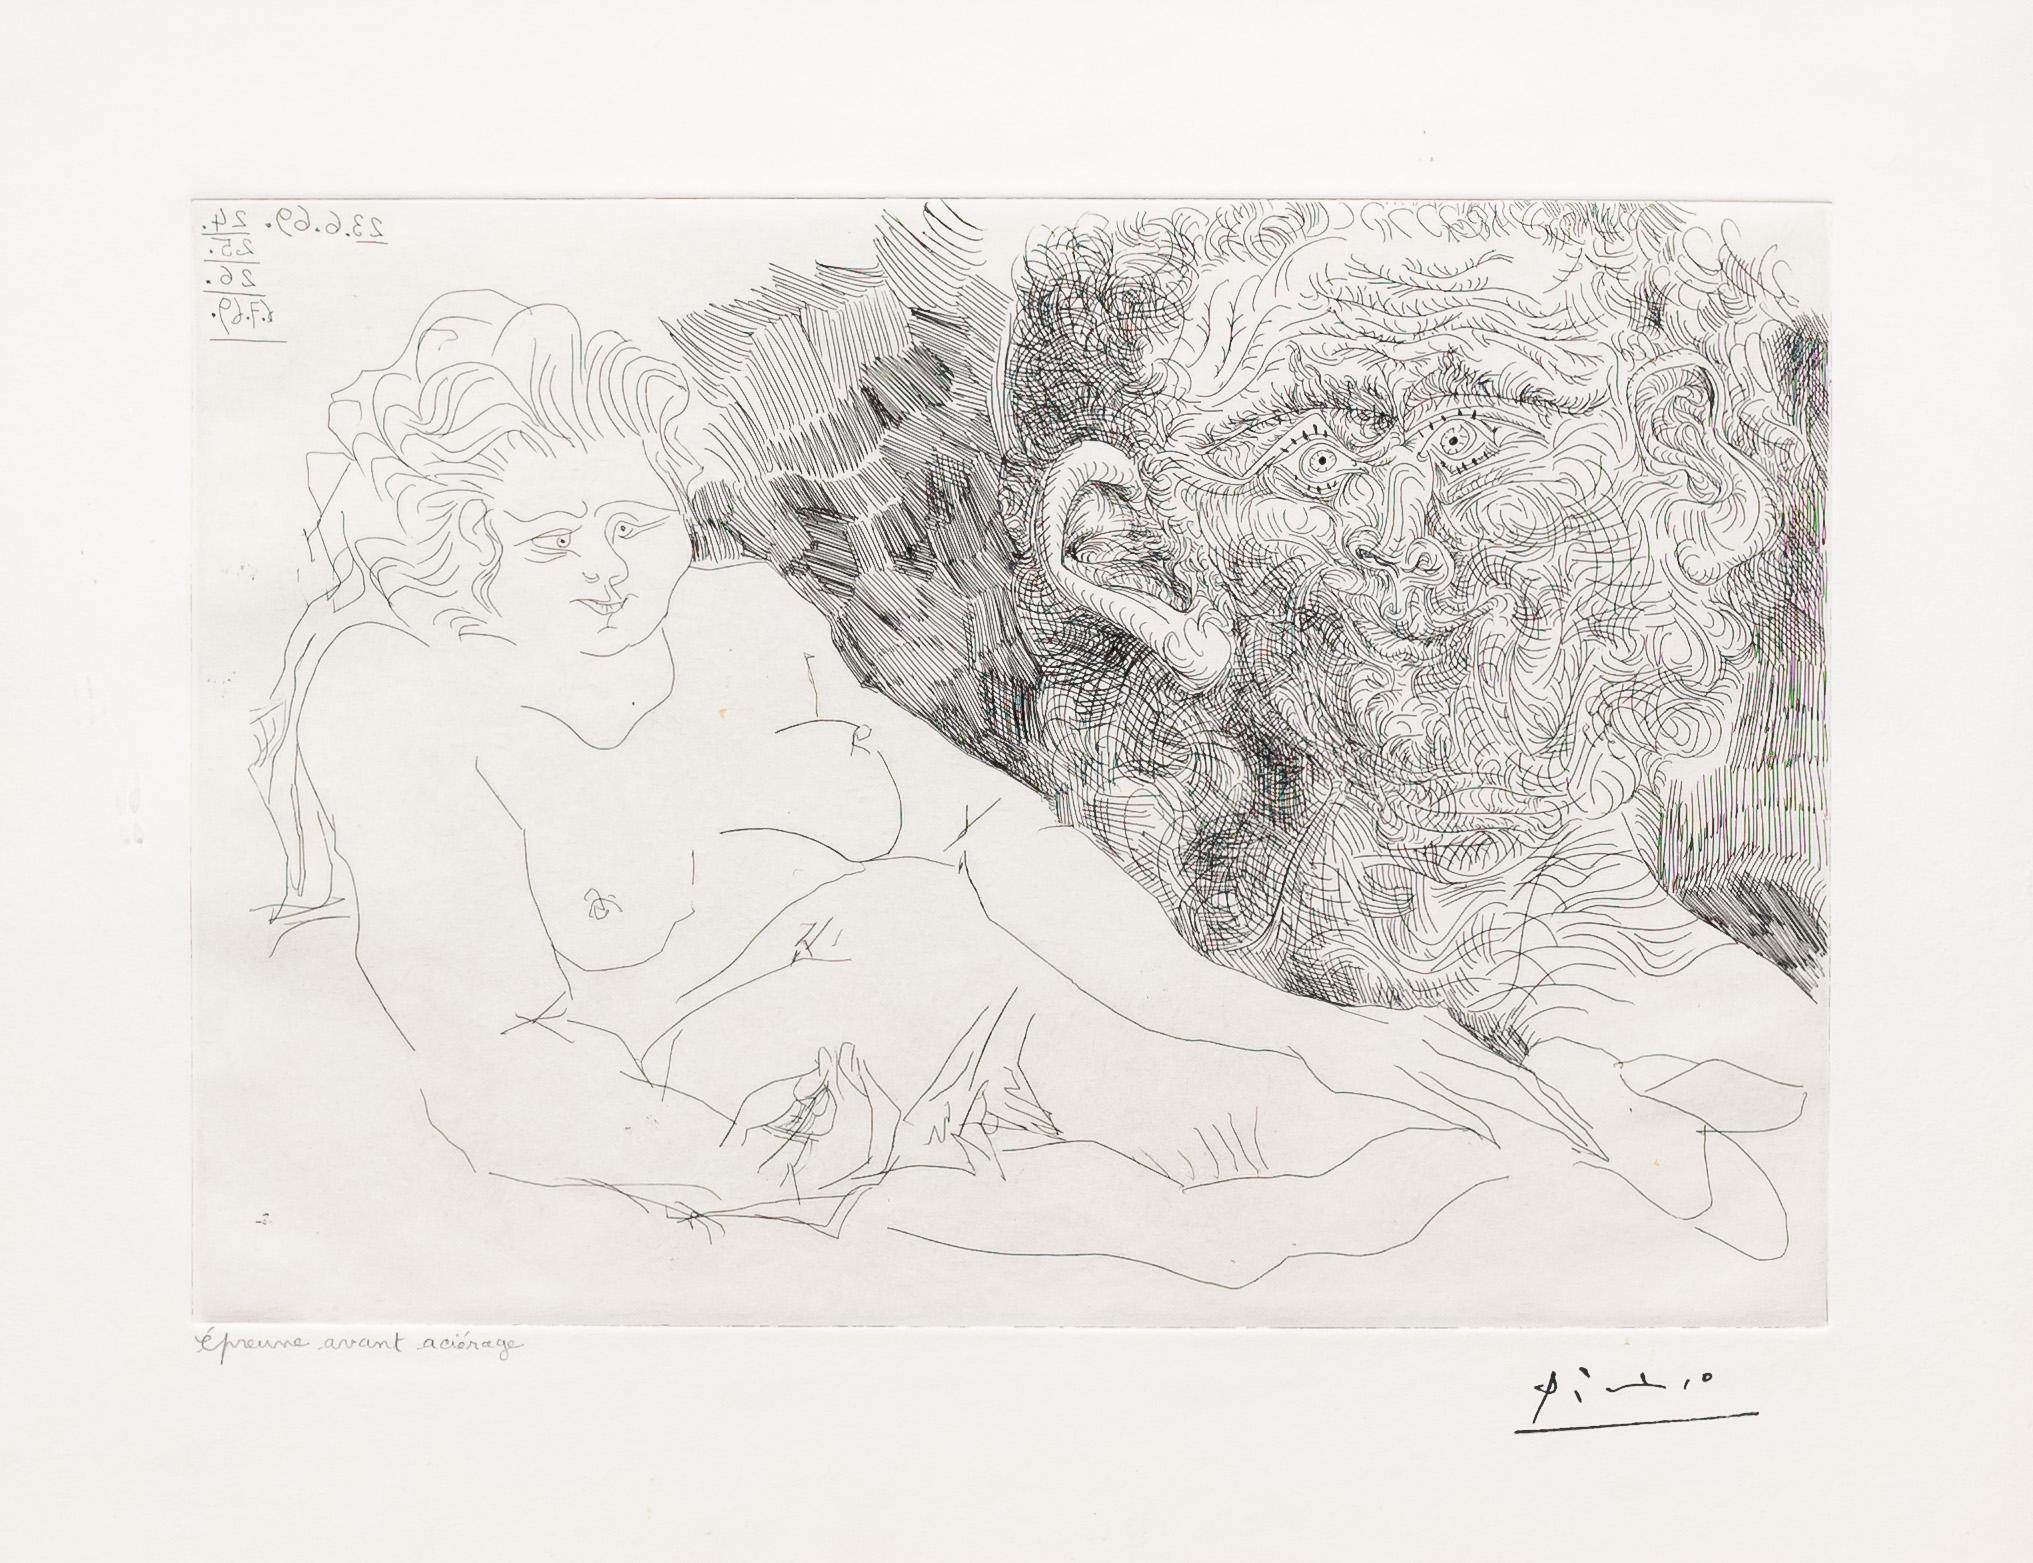 Vieux Peintre et Vieux Modele, from the 156 Series by Pablo Picasso